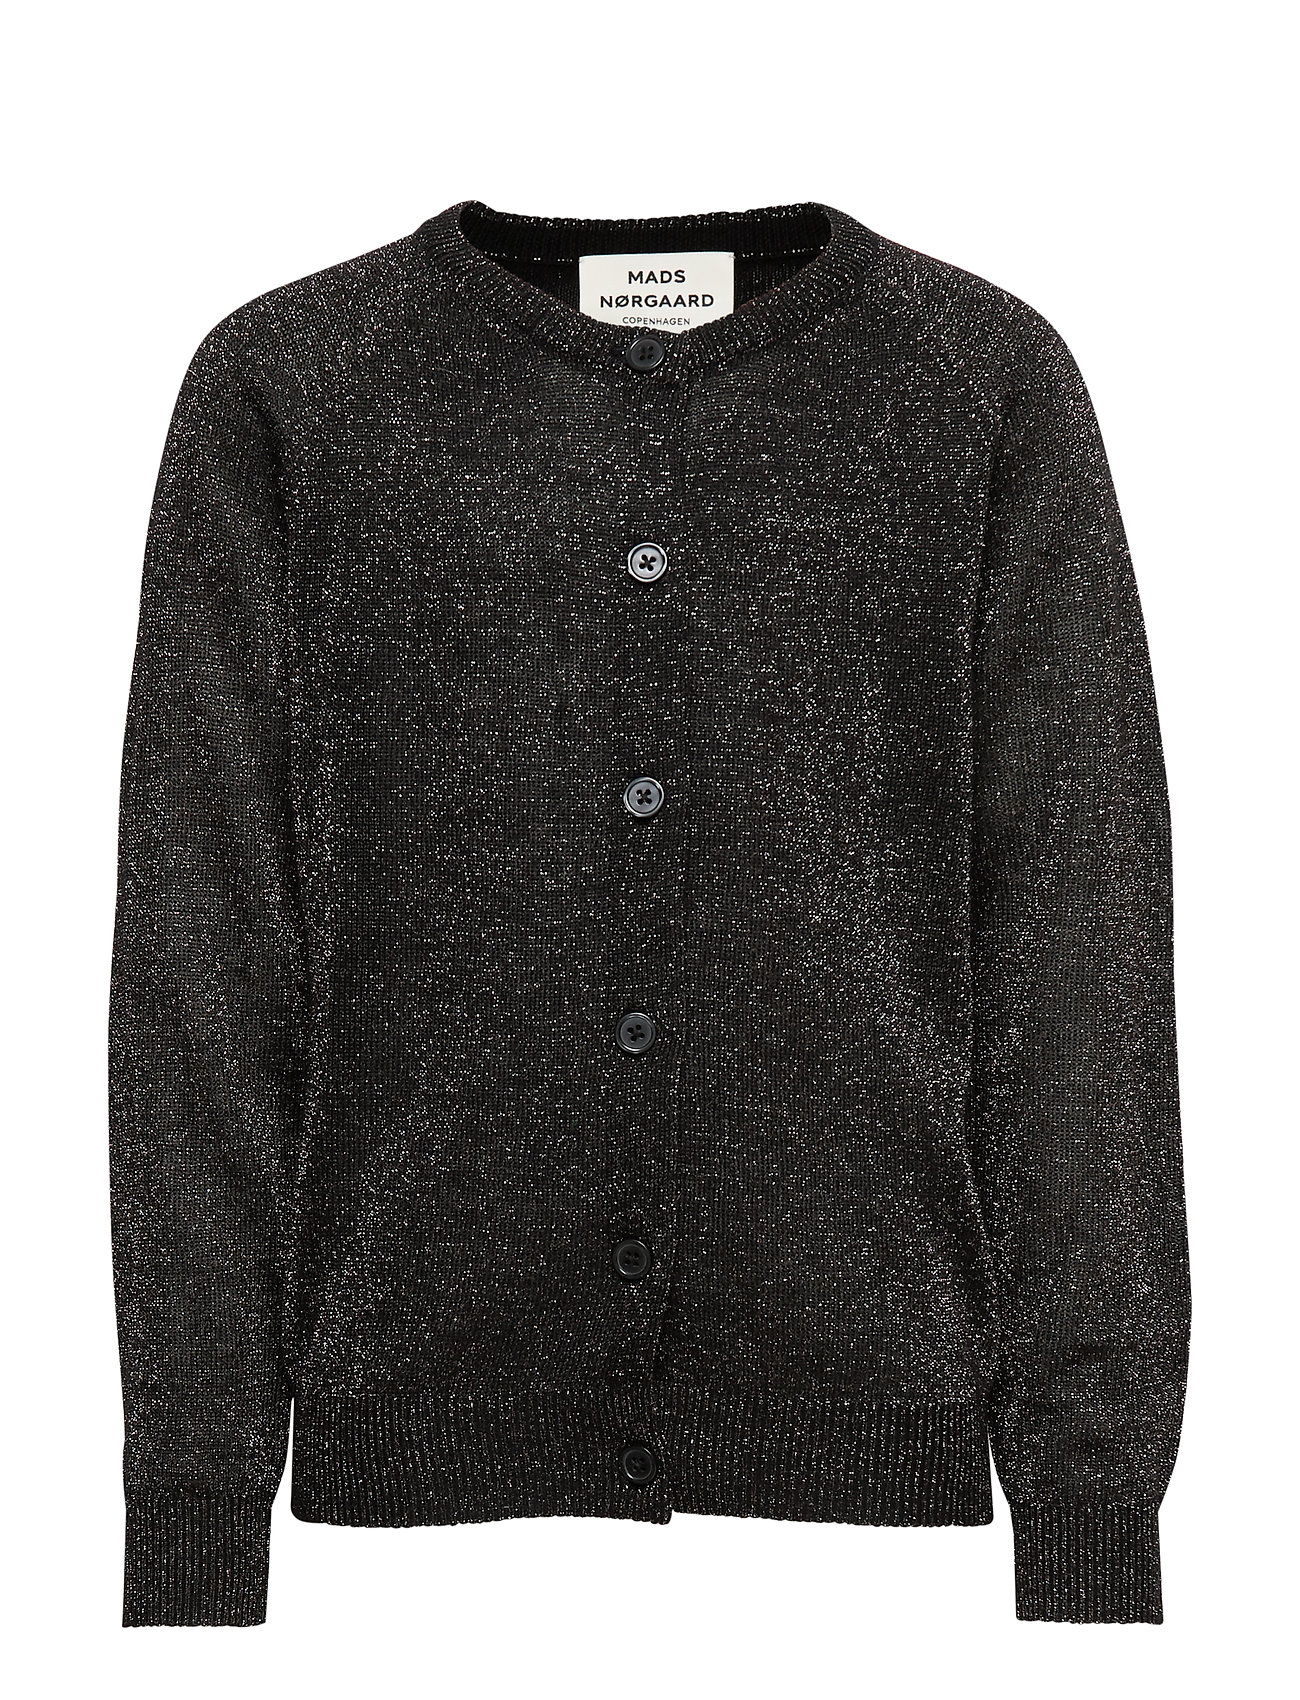 Mads Nørgaard Wool Lurex Carmbino - GLITTERY BLACK